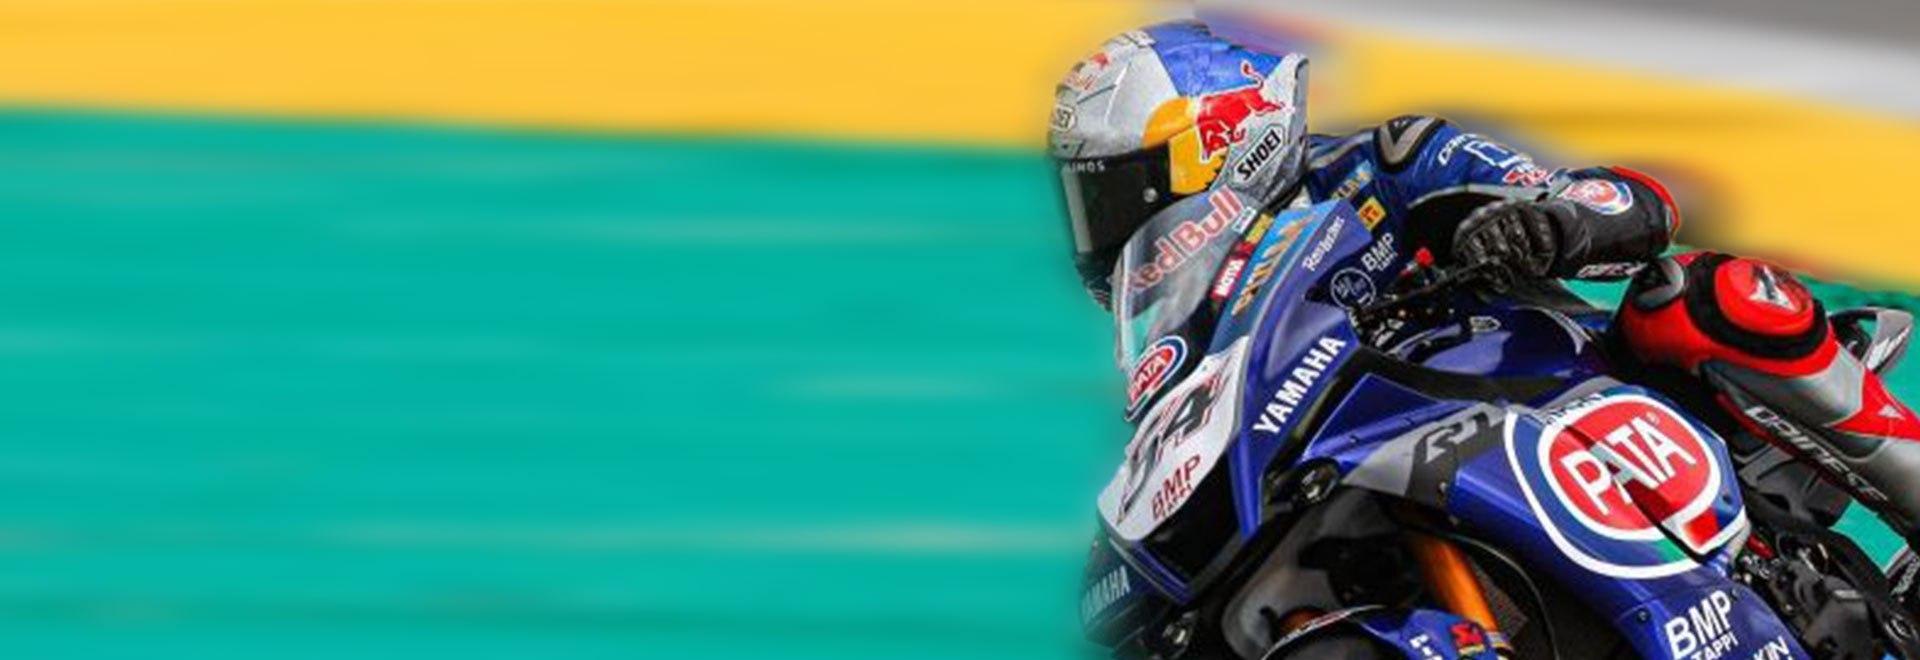 Francia Race 1